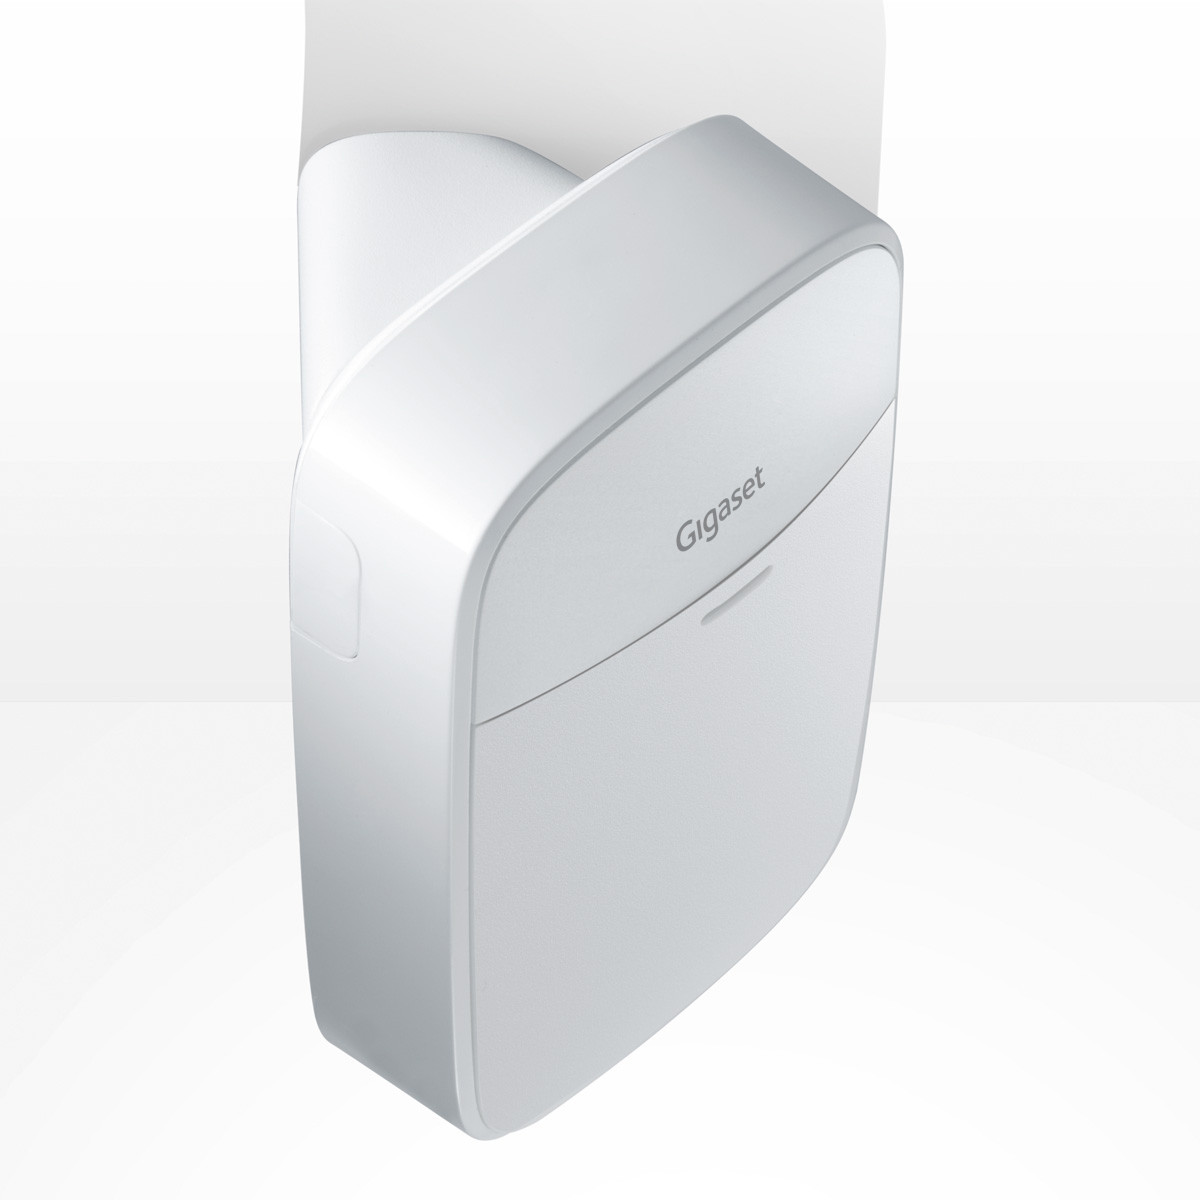 Gigaset Motion Sensor ONE X (pack de 3)